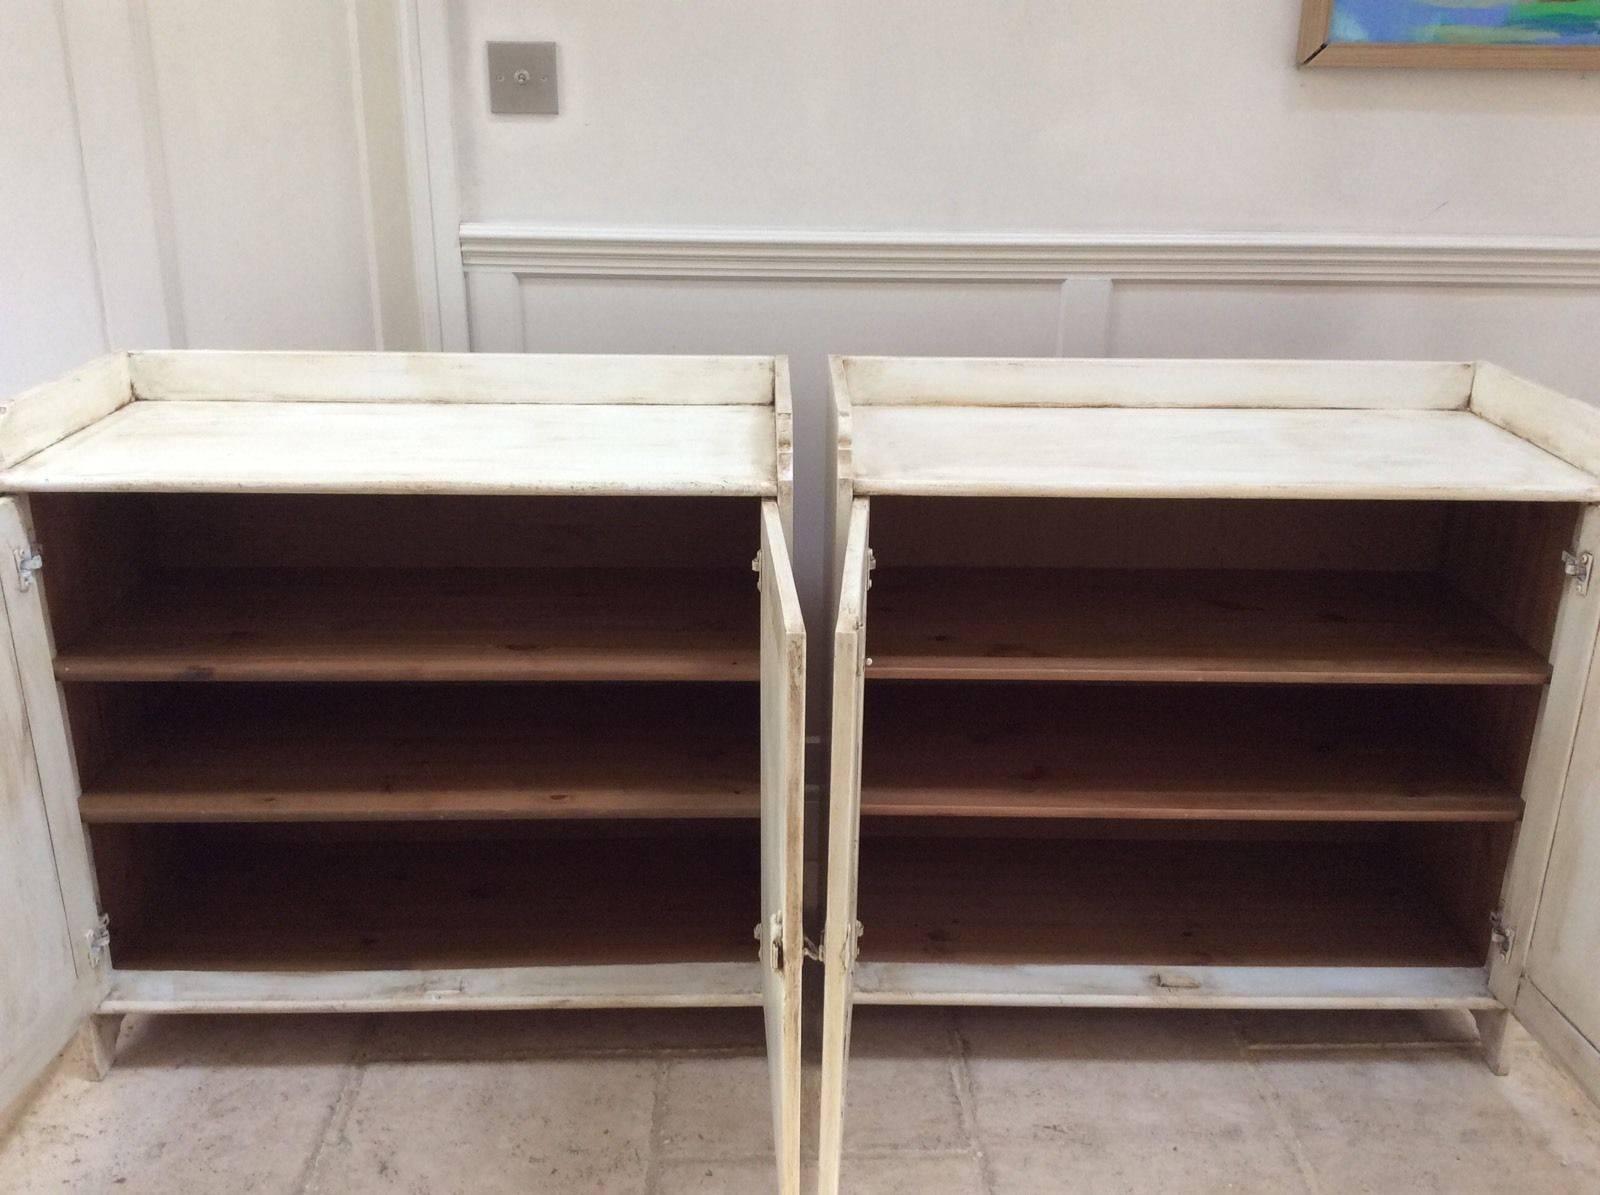 Of Pine Painted Cream Sideboard Freestanding Kitchen Unit Cupboard Inside Free Standing Kitchen Sideboard (View 13 of 20)